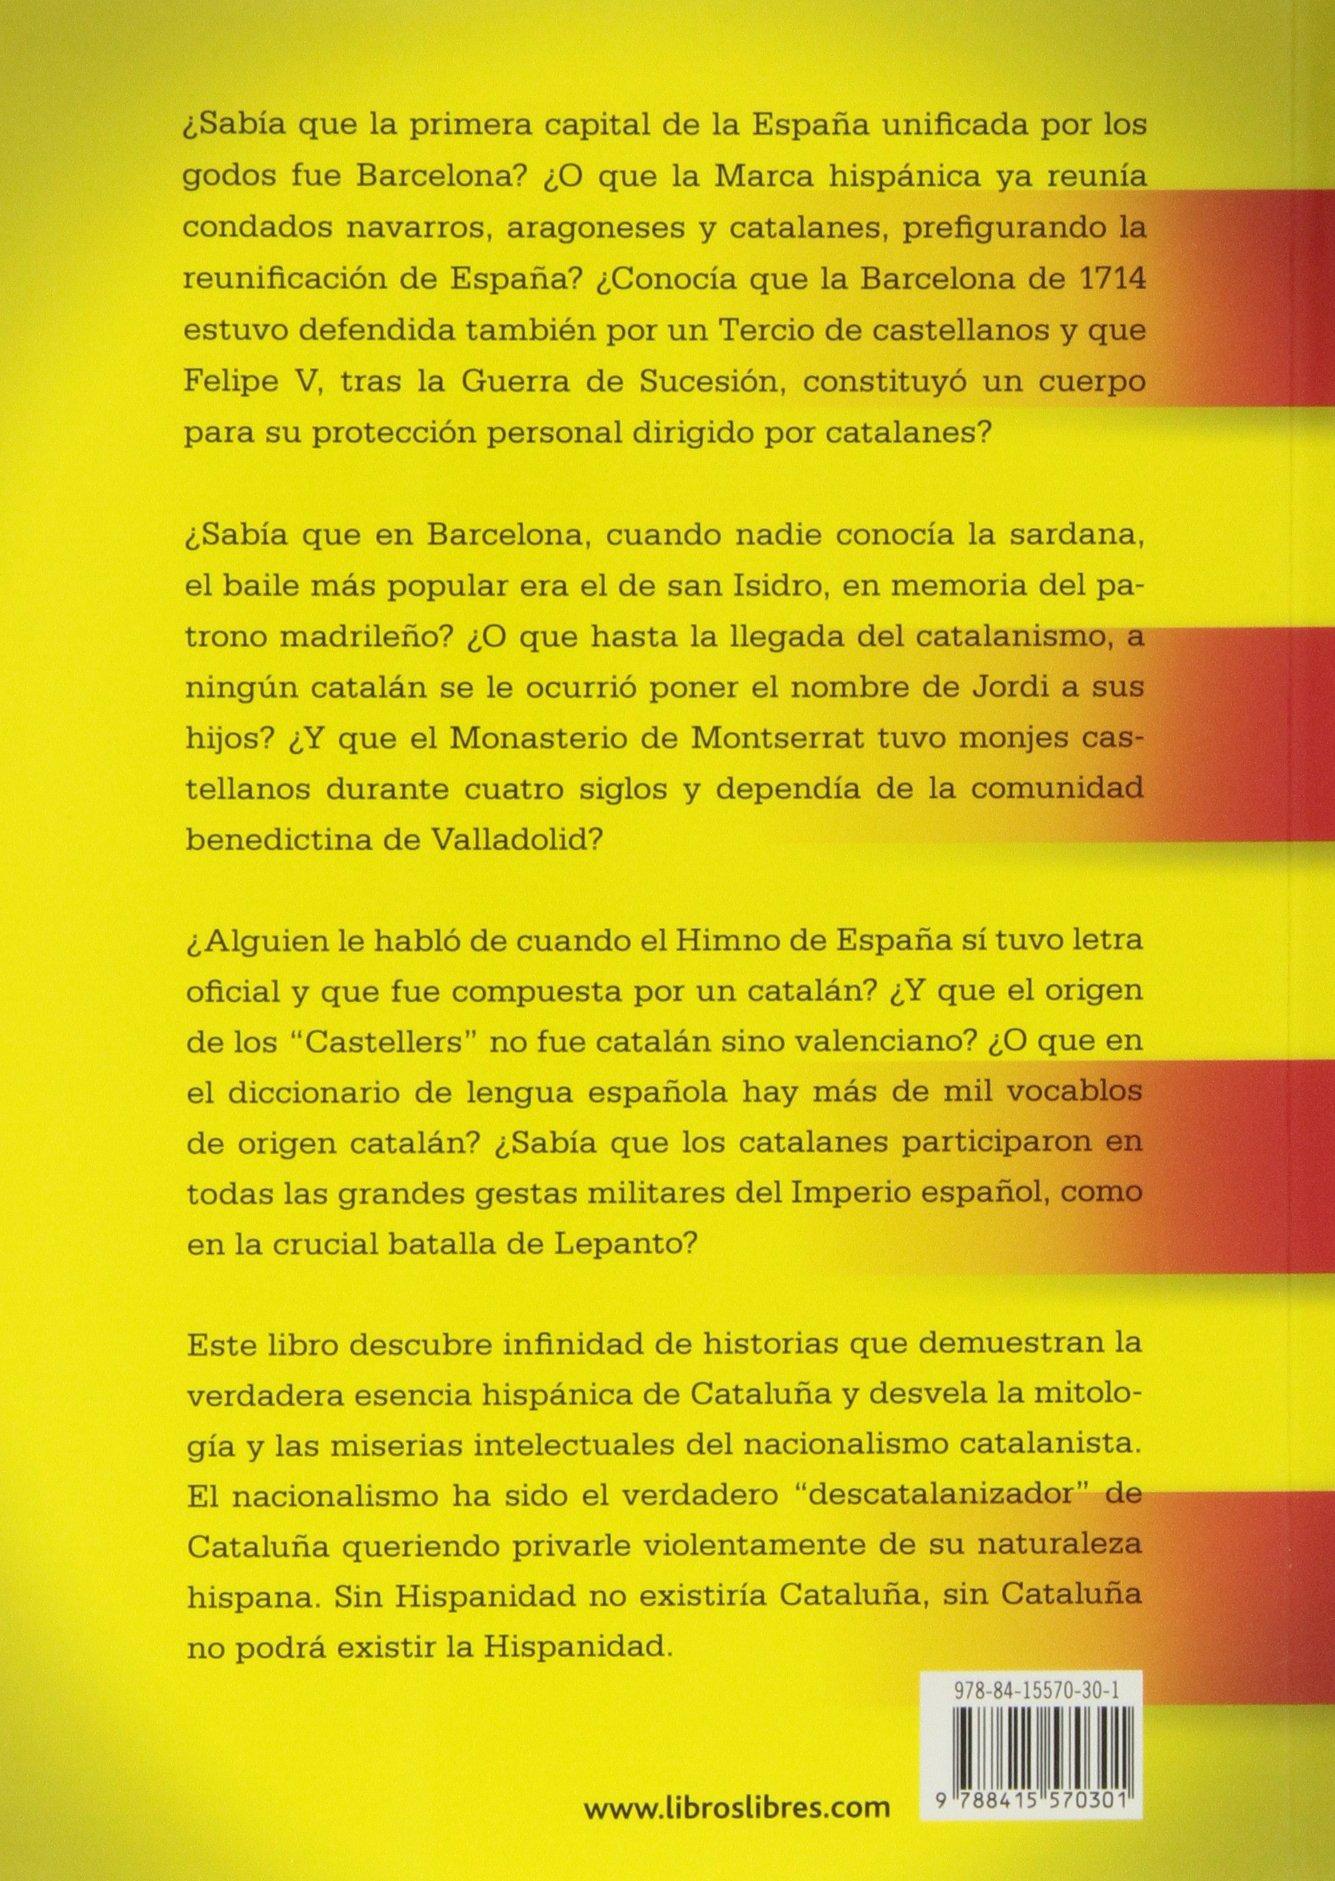 - Cataluña Hispana by Javier Barraycoa - AbeBooks